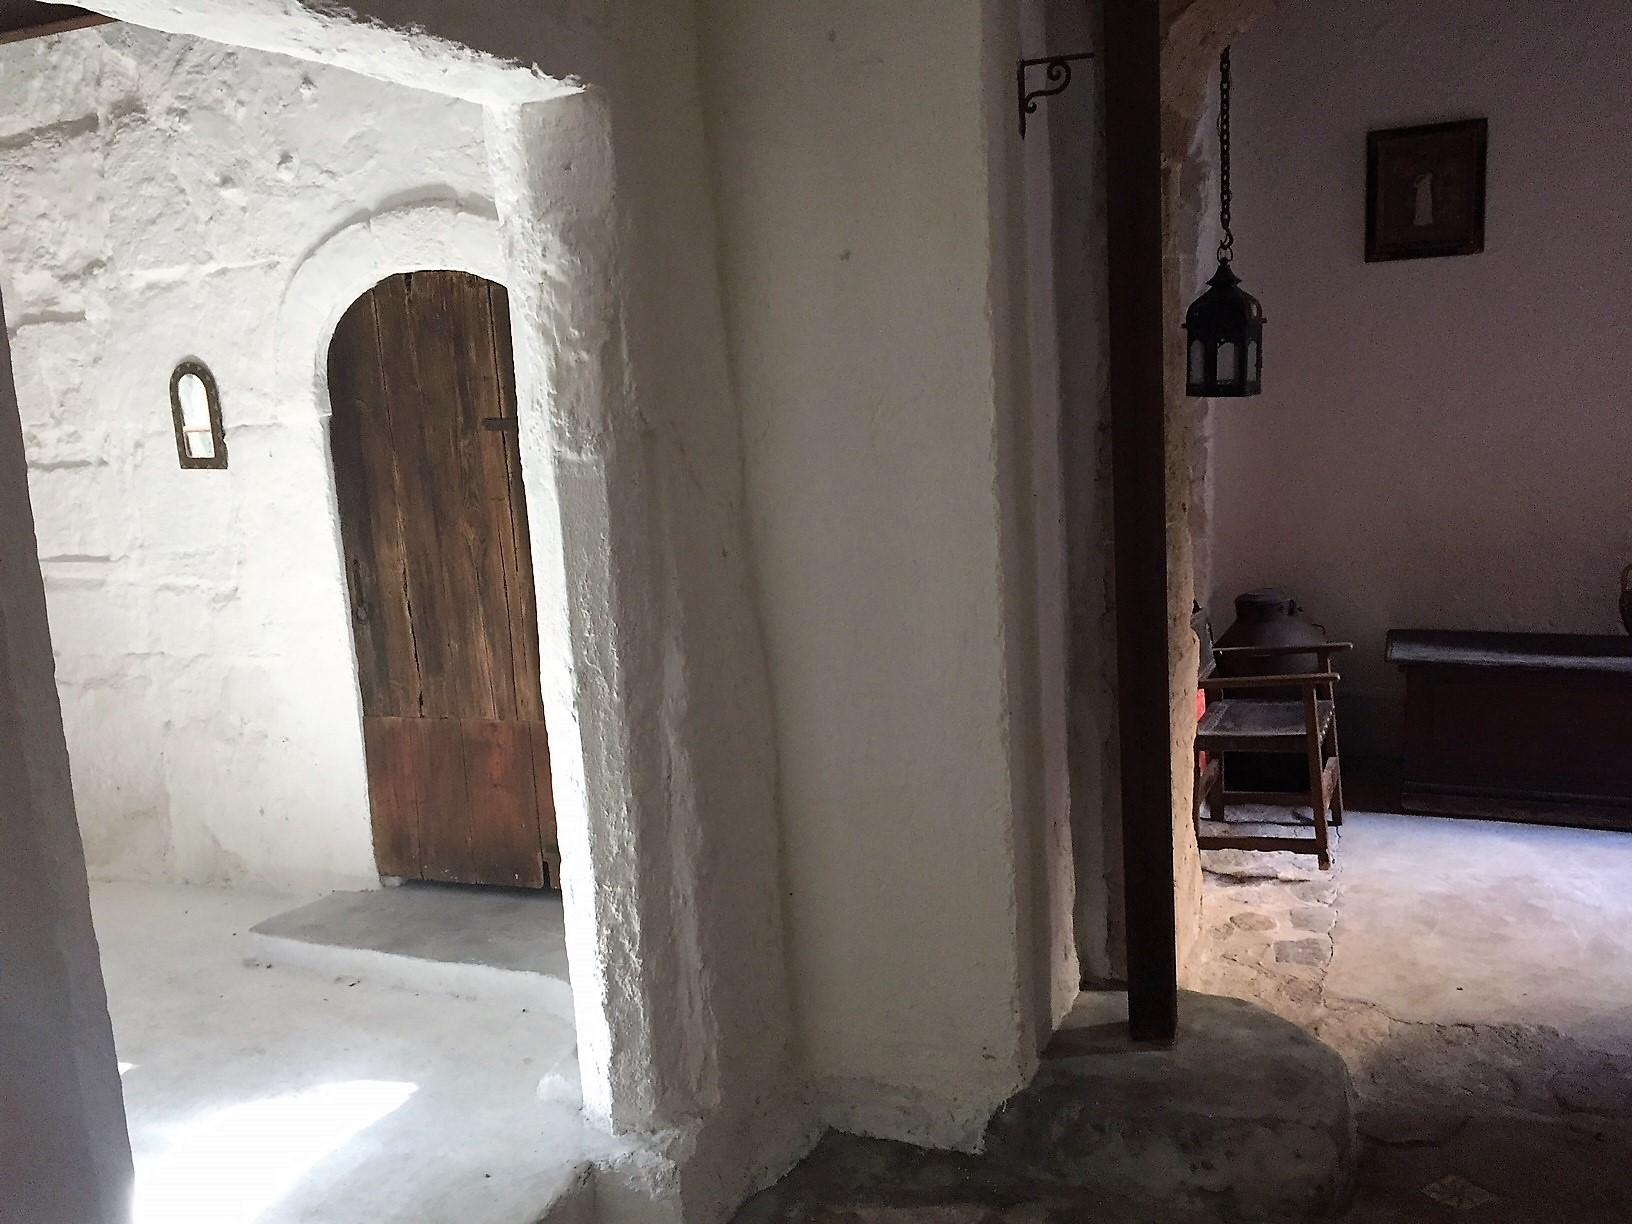 Einzelstück – Historische Erdgeschosswohnung in bester Altstadtlage in Palma, Mallorca